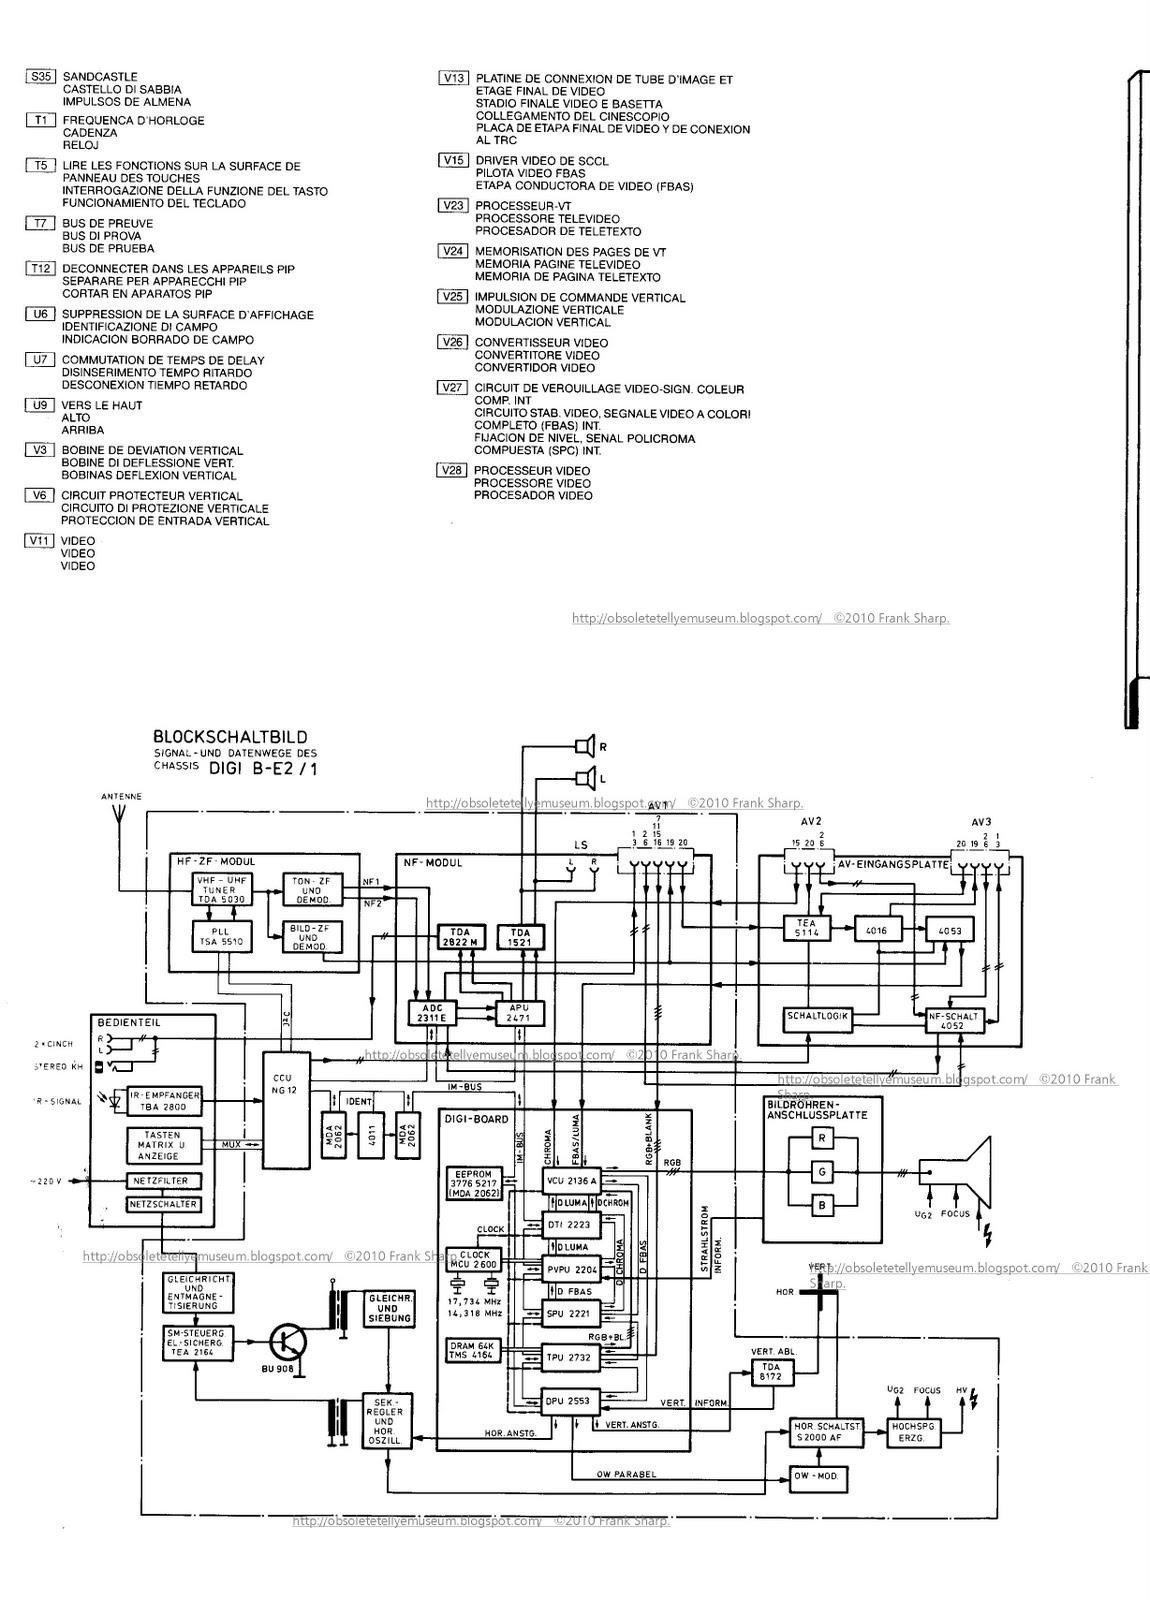 obsolete technology tellye itt nokia 7181 pip digivision black itt nokia 7181 pip digivision black line ifb 681 chassis digi be 2 pip blackplanigon 5861 69 49